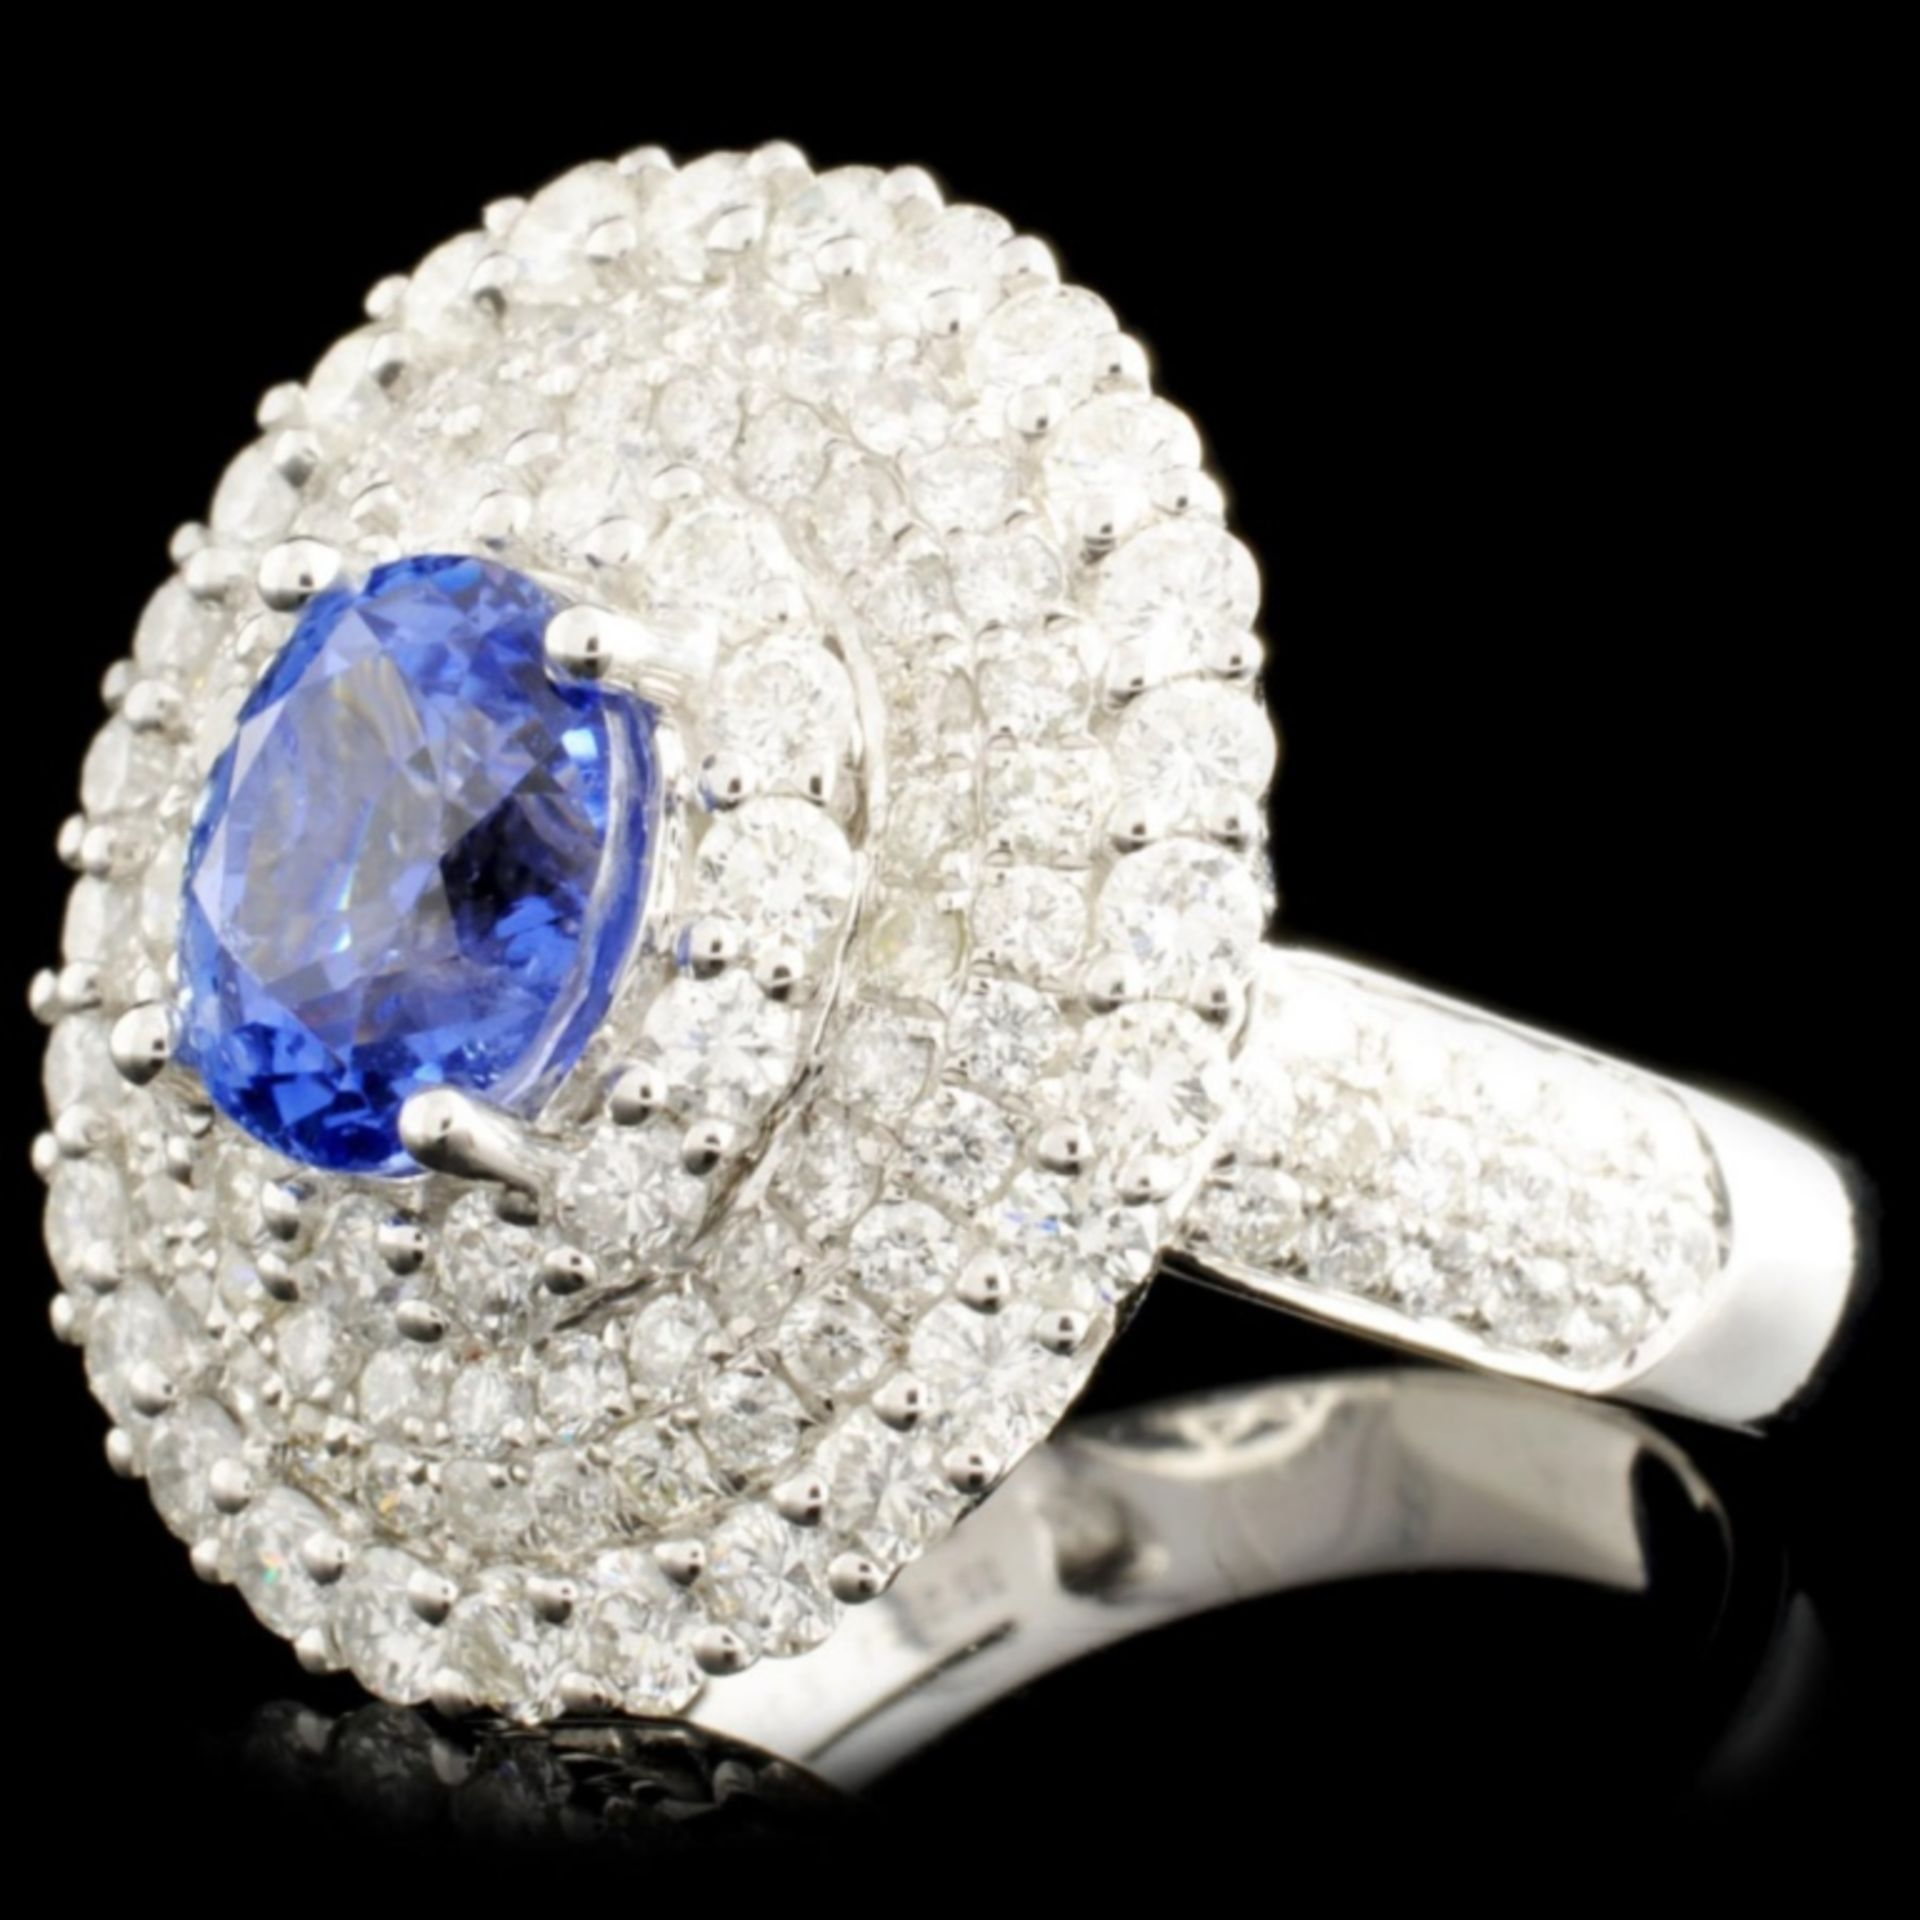 18K Gold 2.71ct Sapphire & 2.52ctw Diamond Ring - Image 2 of 5